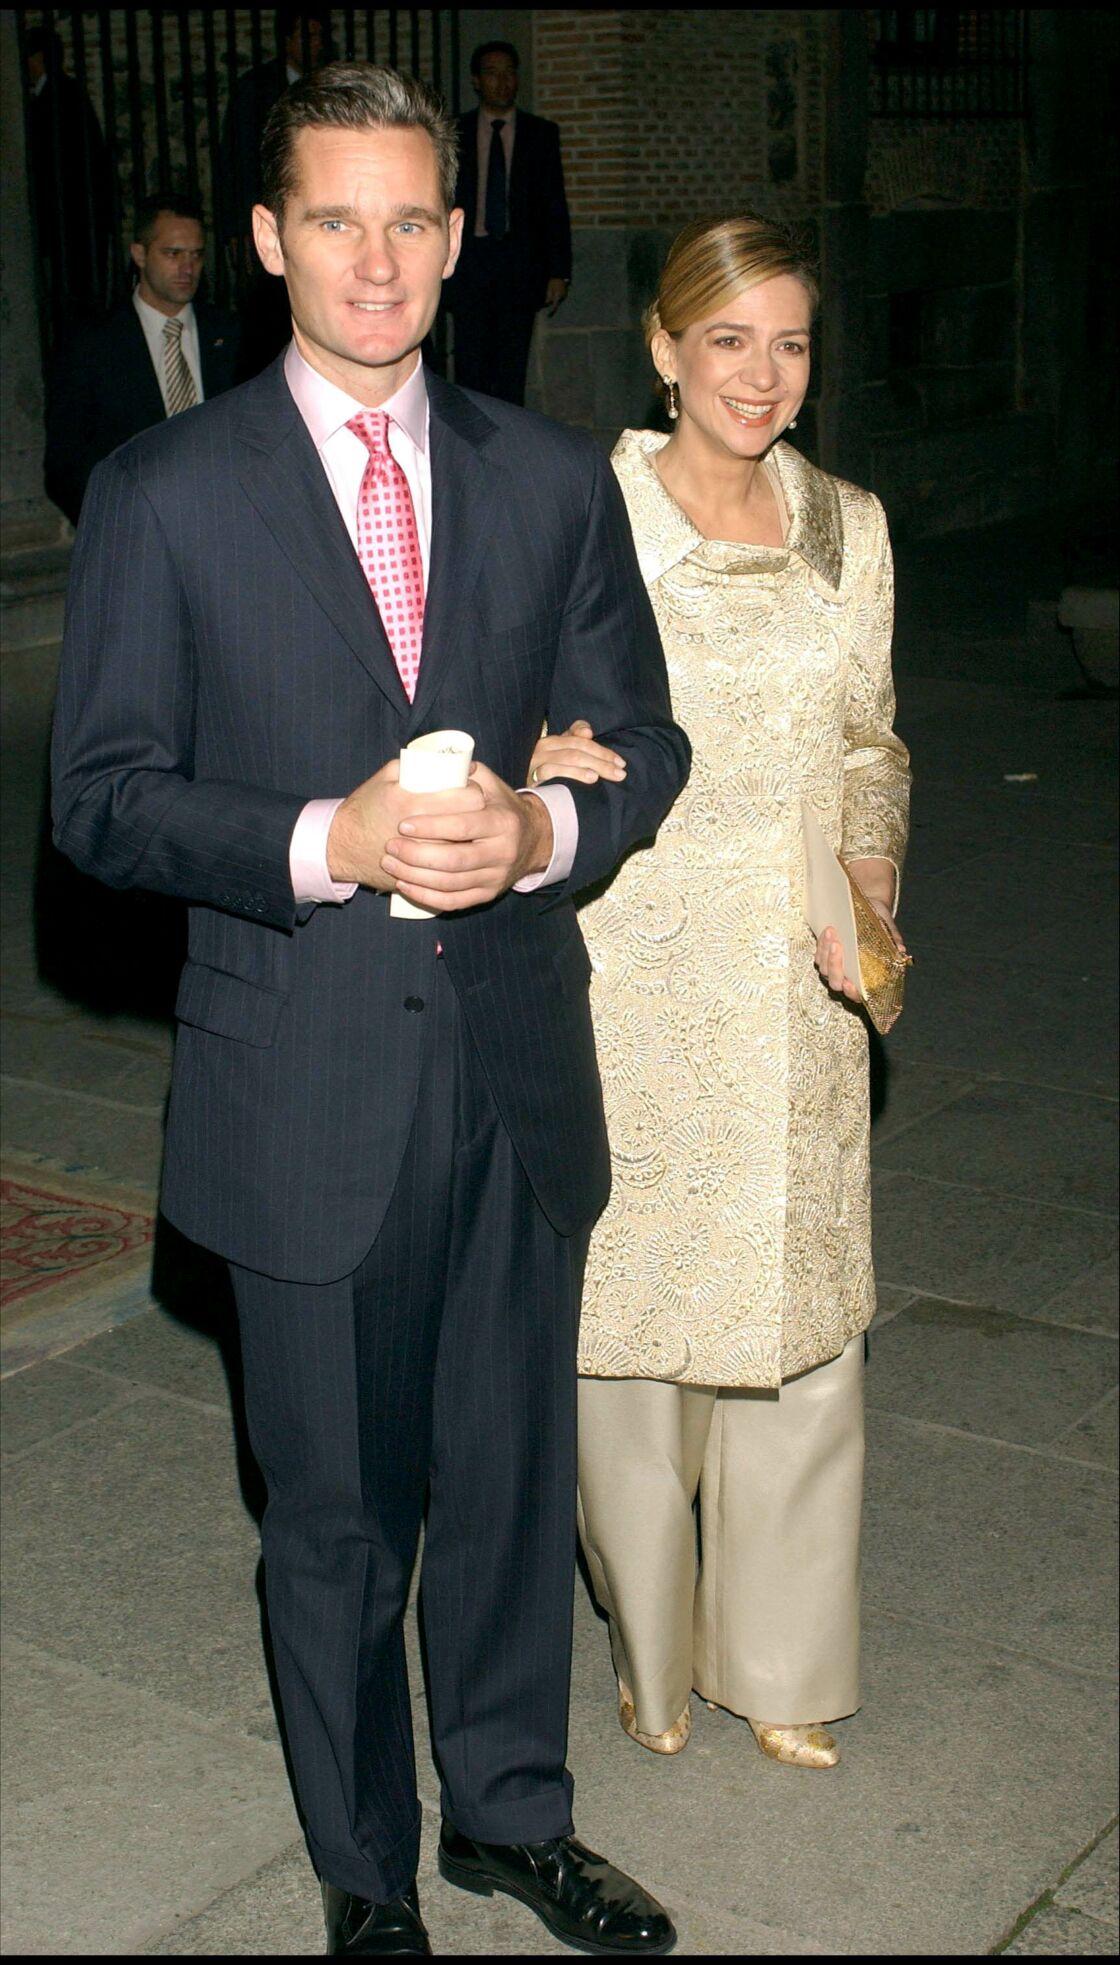 L'infante Cristina et son époux Iñaki Urdangarin